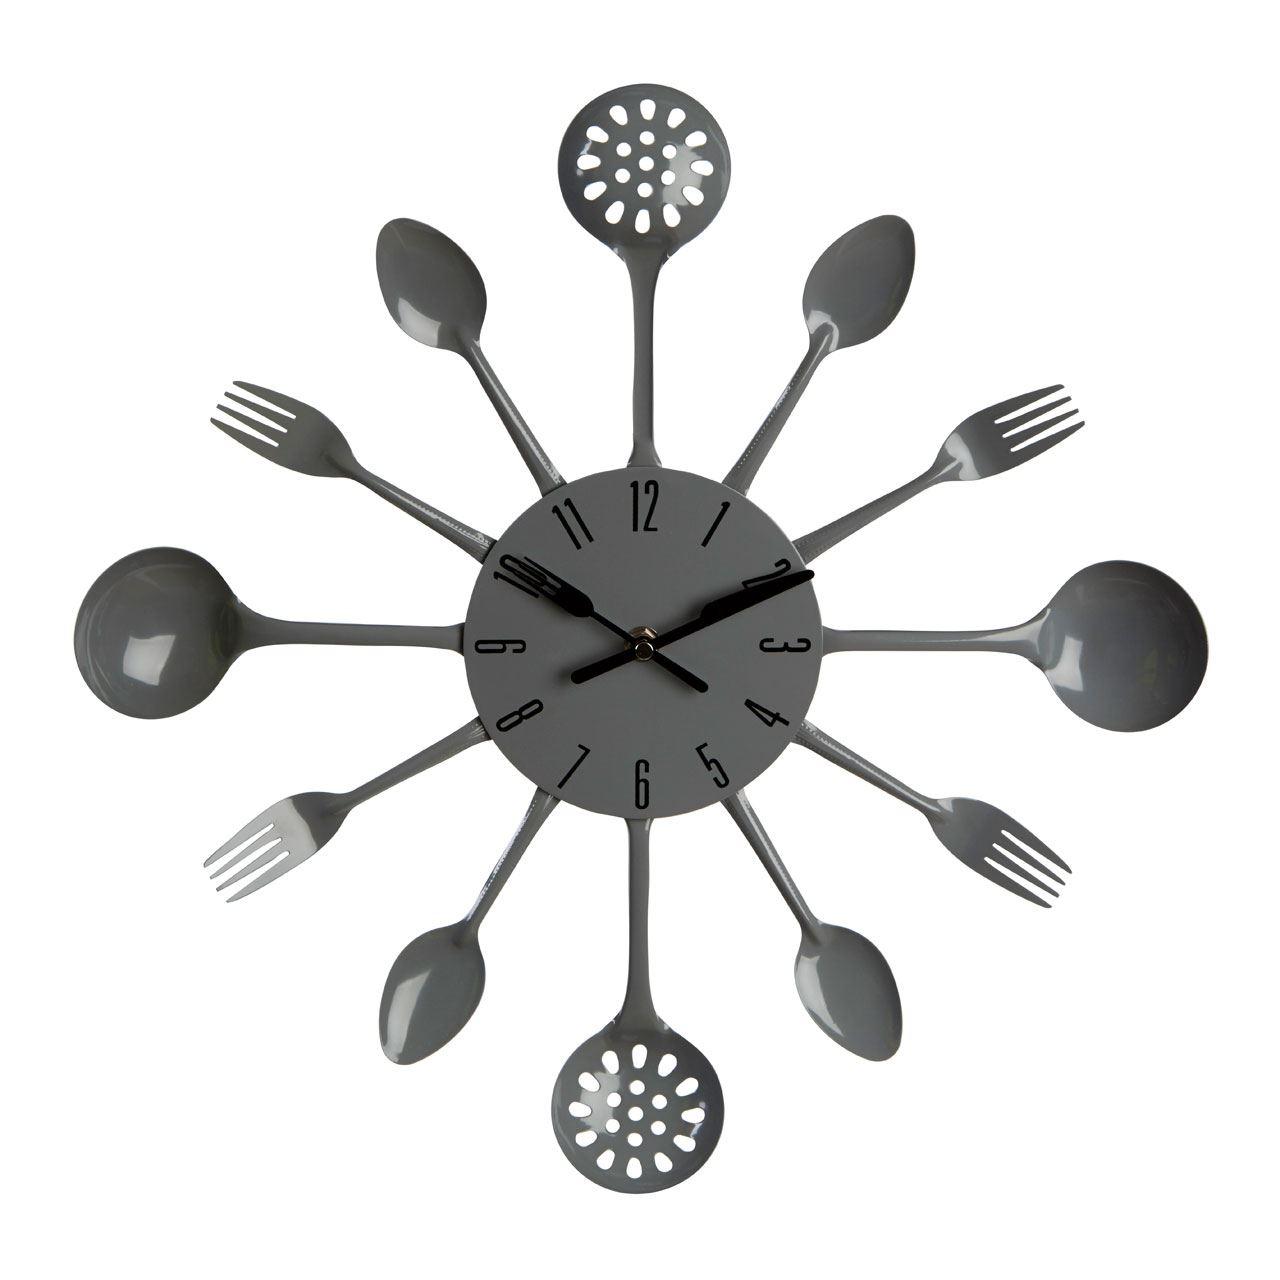 Uniquebella Metal Kitchen Cutlery Utensil Wall Clock Spoon: Kitchen Cutlery Wall Clock Wall Mounted Spoon Fork Ladle